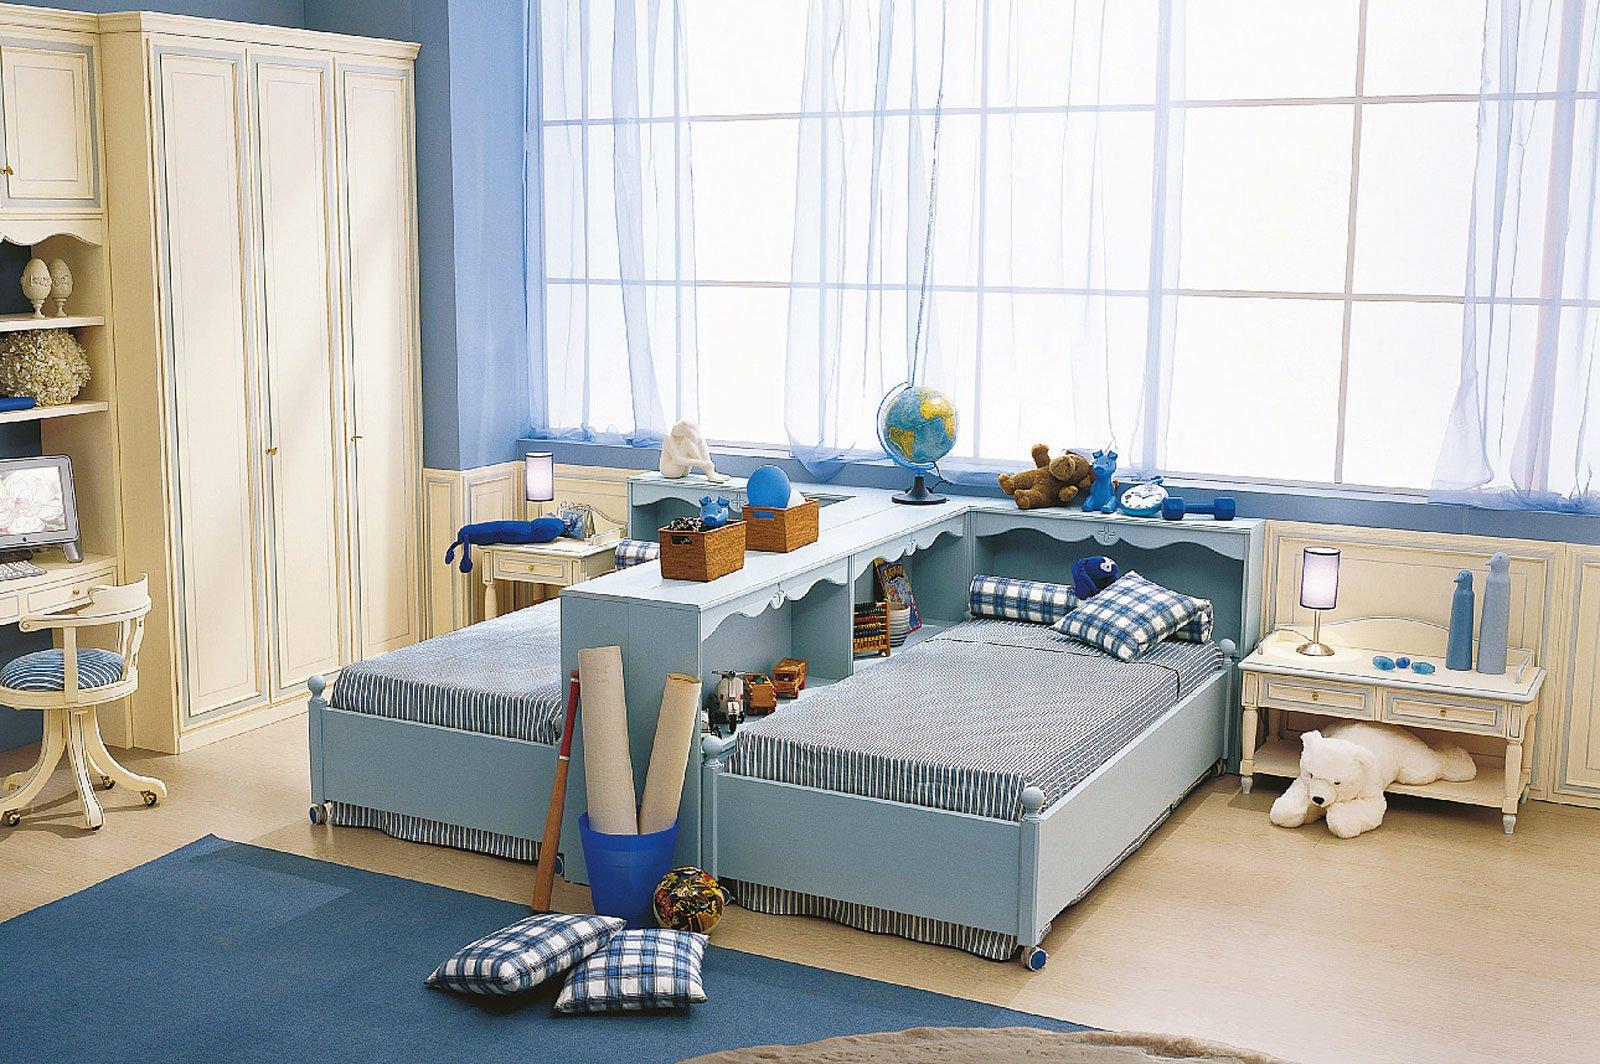 Cose Di Casa Camerette.Camerette Multifunzione Per Bambini E Ragazzi Cose Di Casa